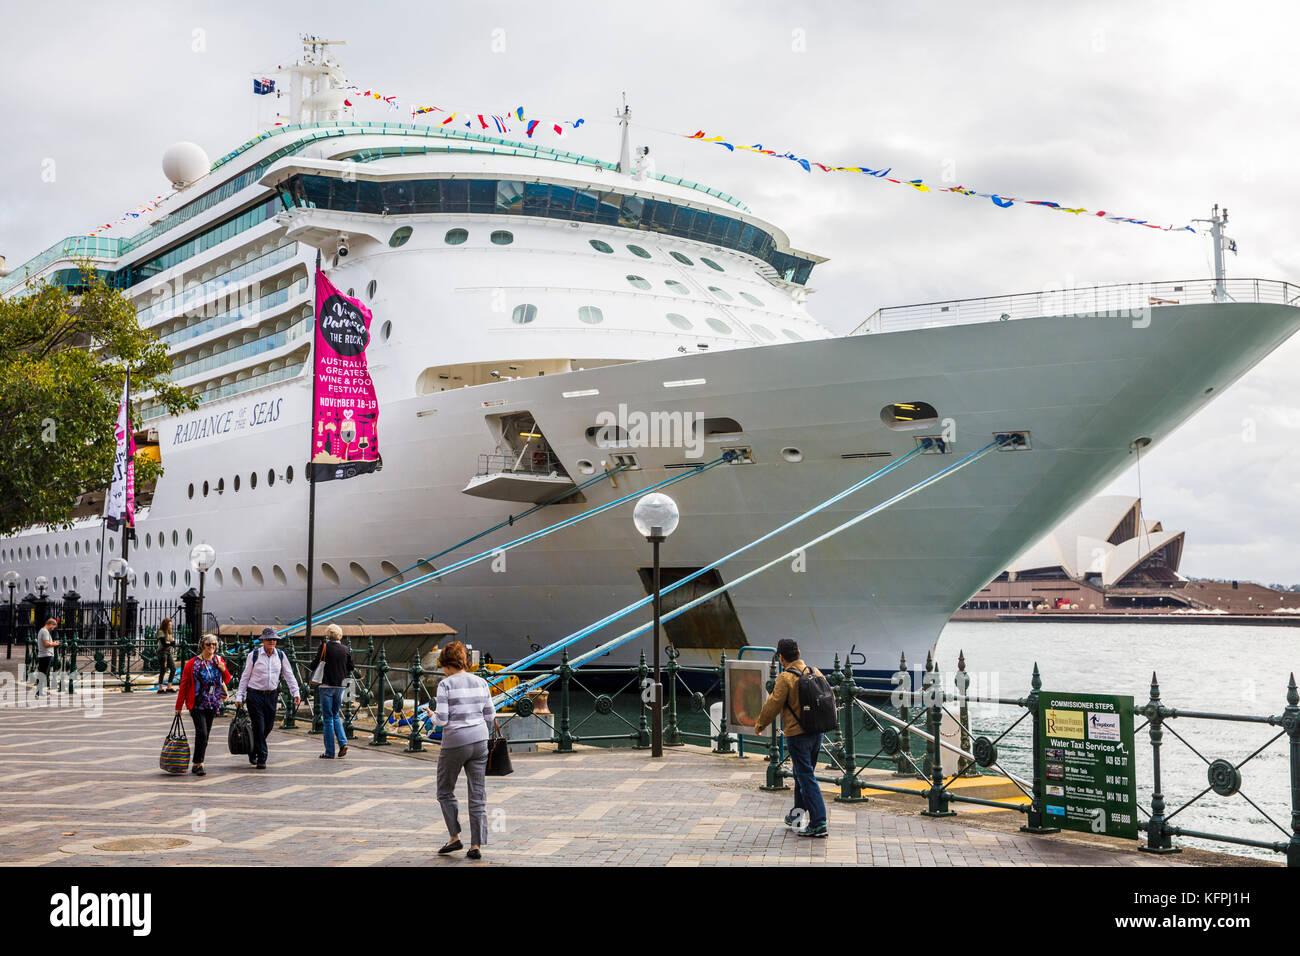 Sydney, Australia. 31st Oct, 2017. Cruise ship Radiance of the Seas operated by Royal Caribbean International arrives - Stock Image